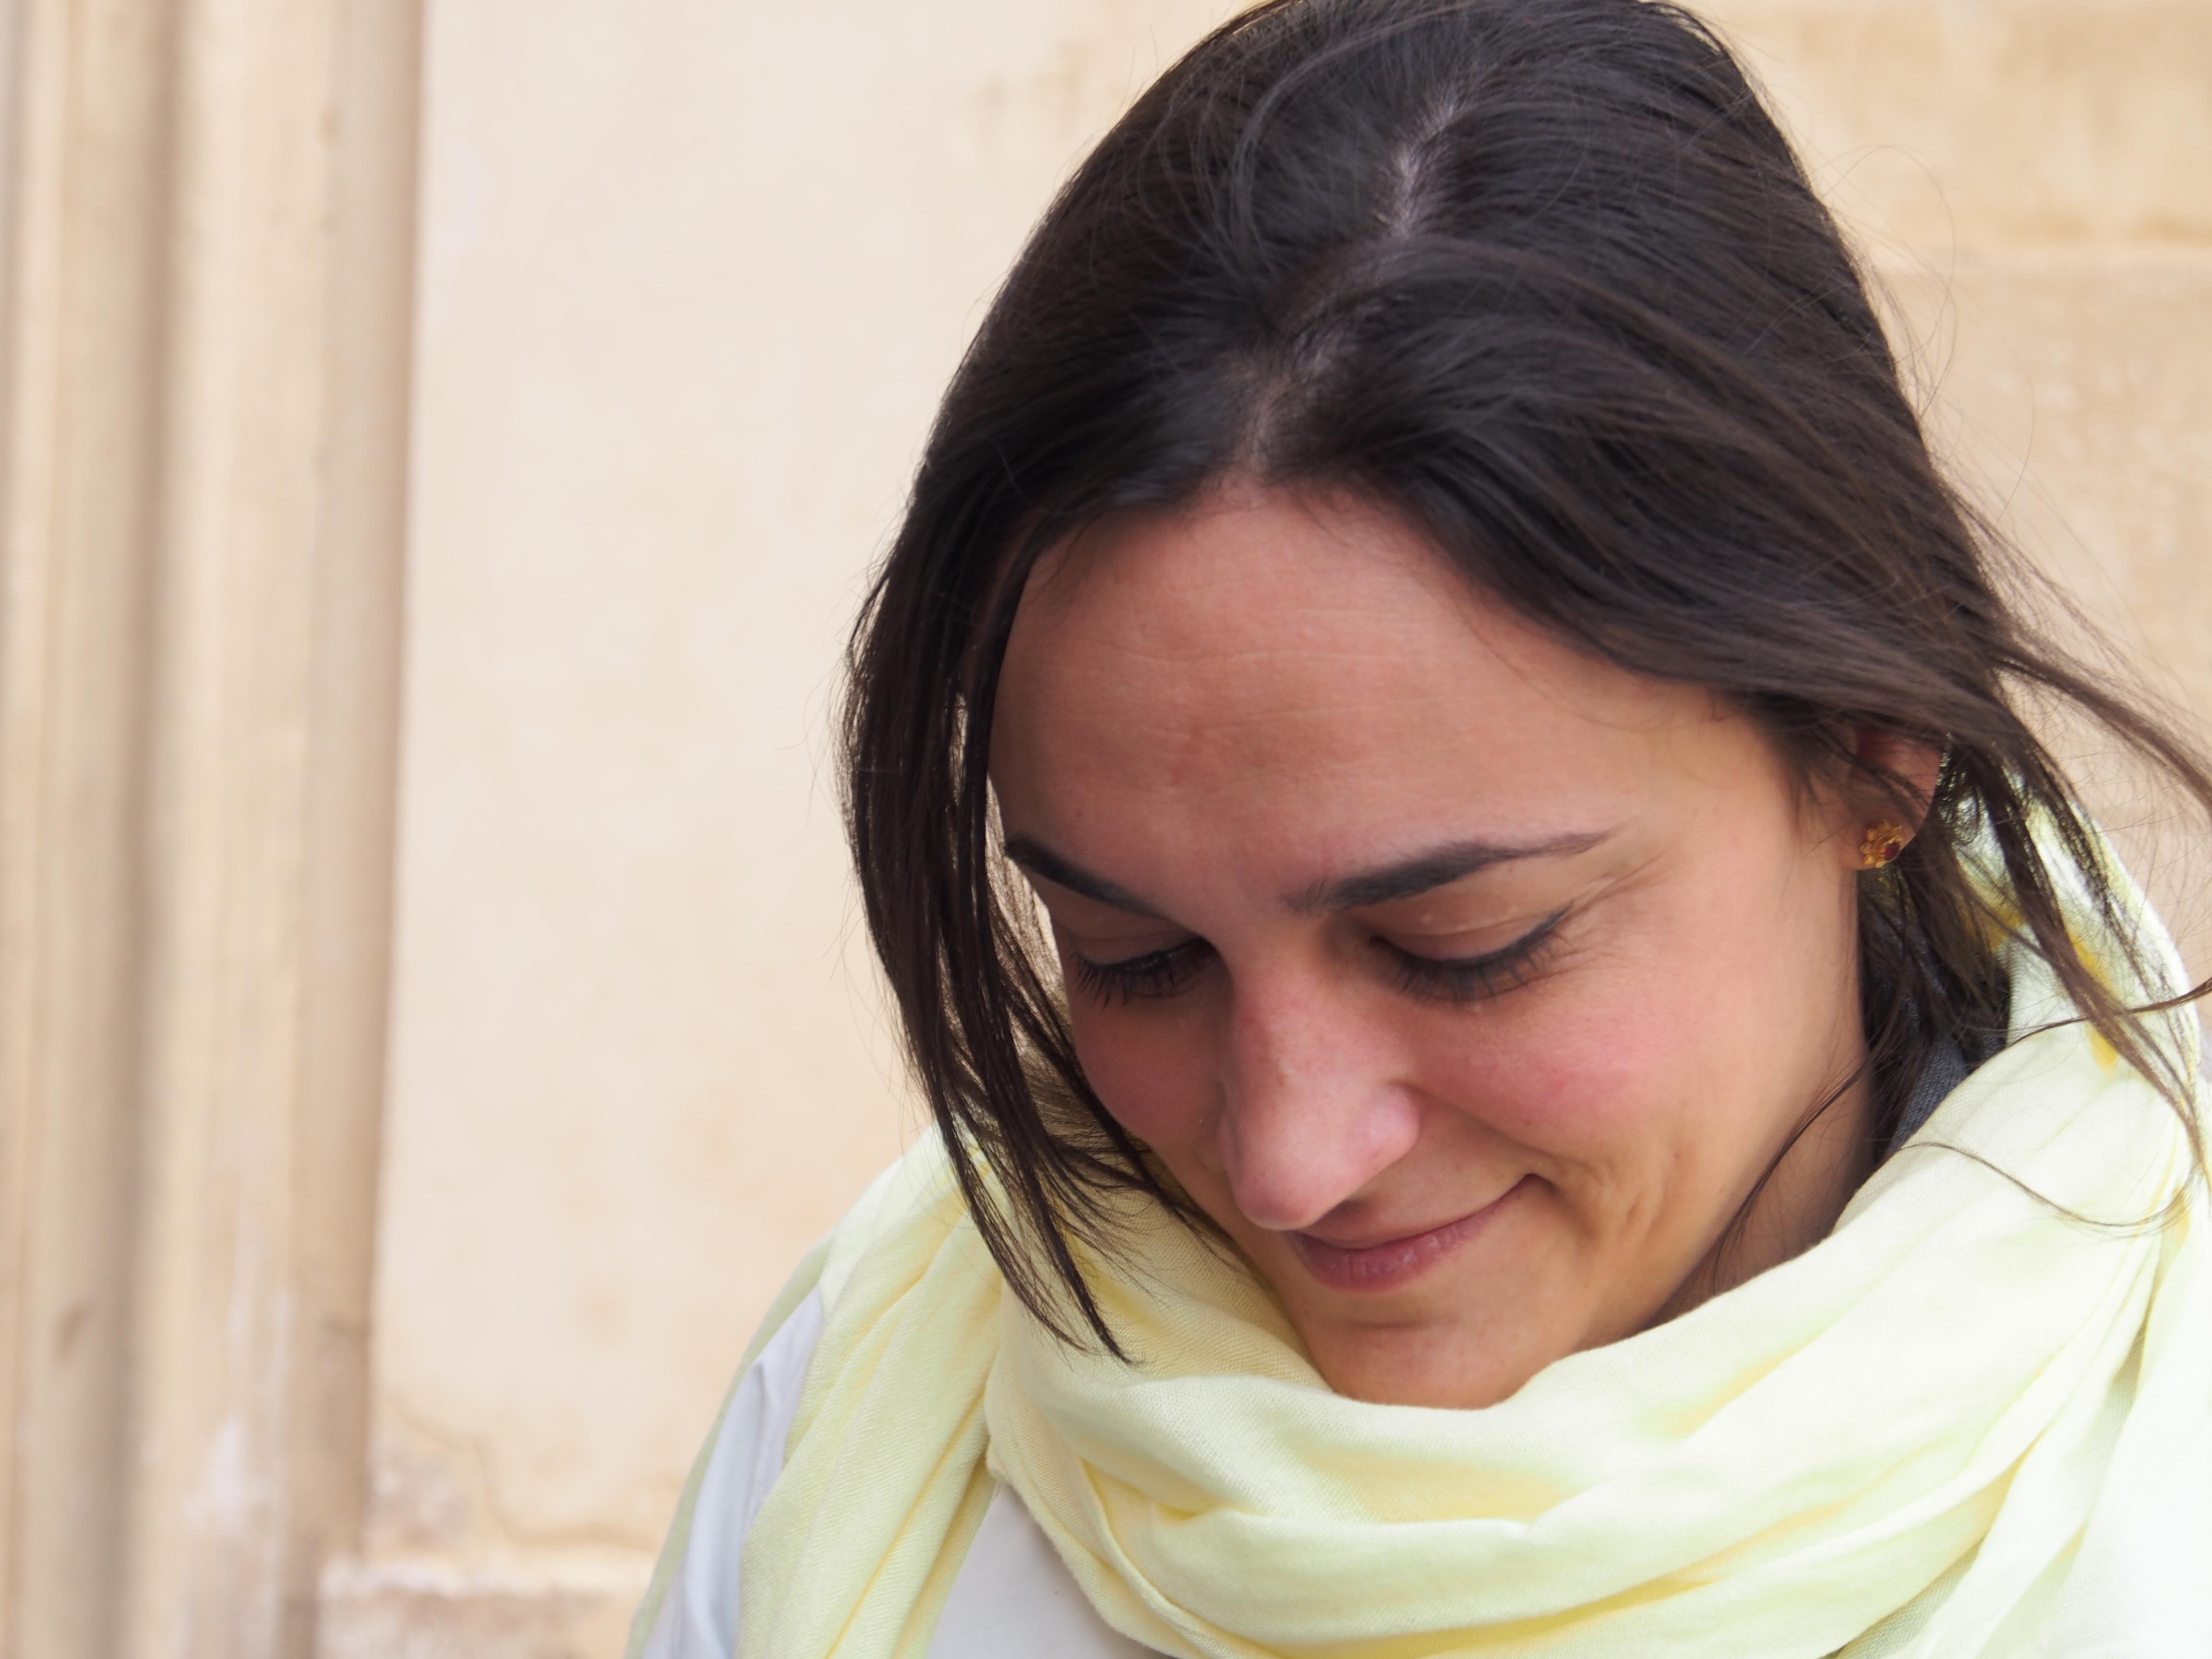 Sara Pedrola